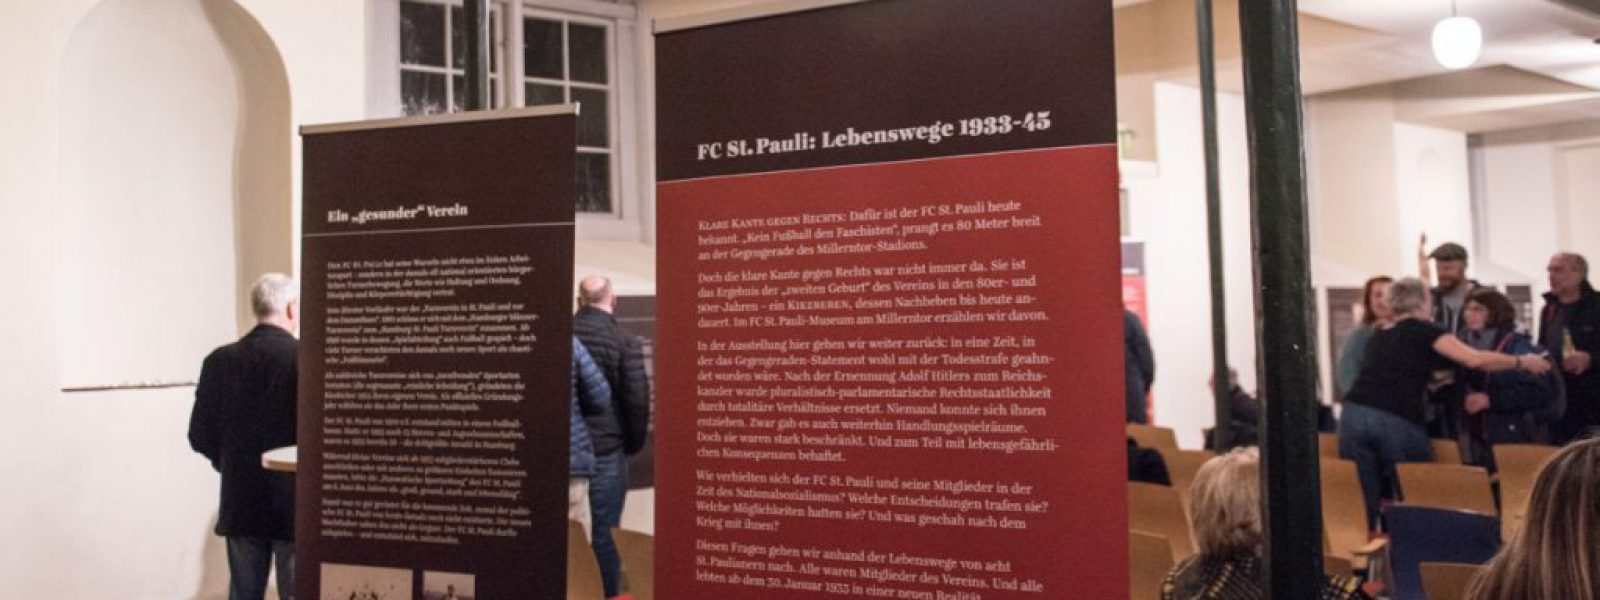 Vernissage FC St Pauli Lebenswege 1933-45 (Foto Sabrina Adeline Nagel) - 14